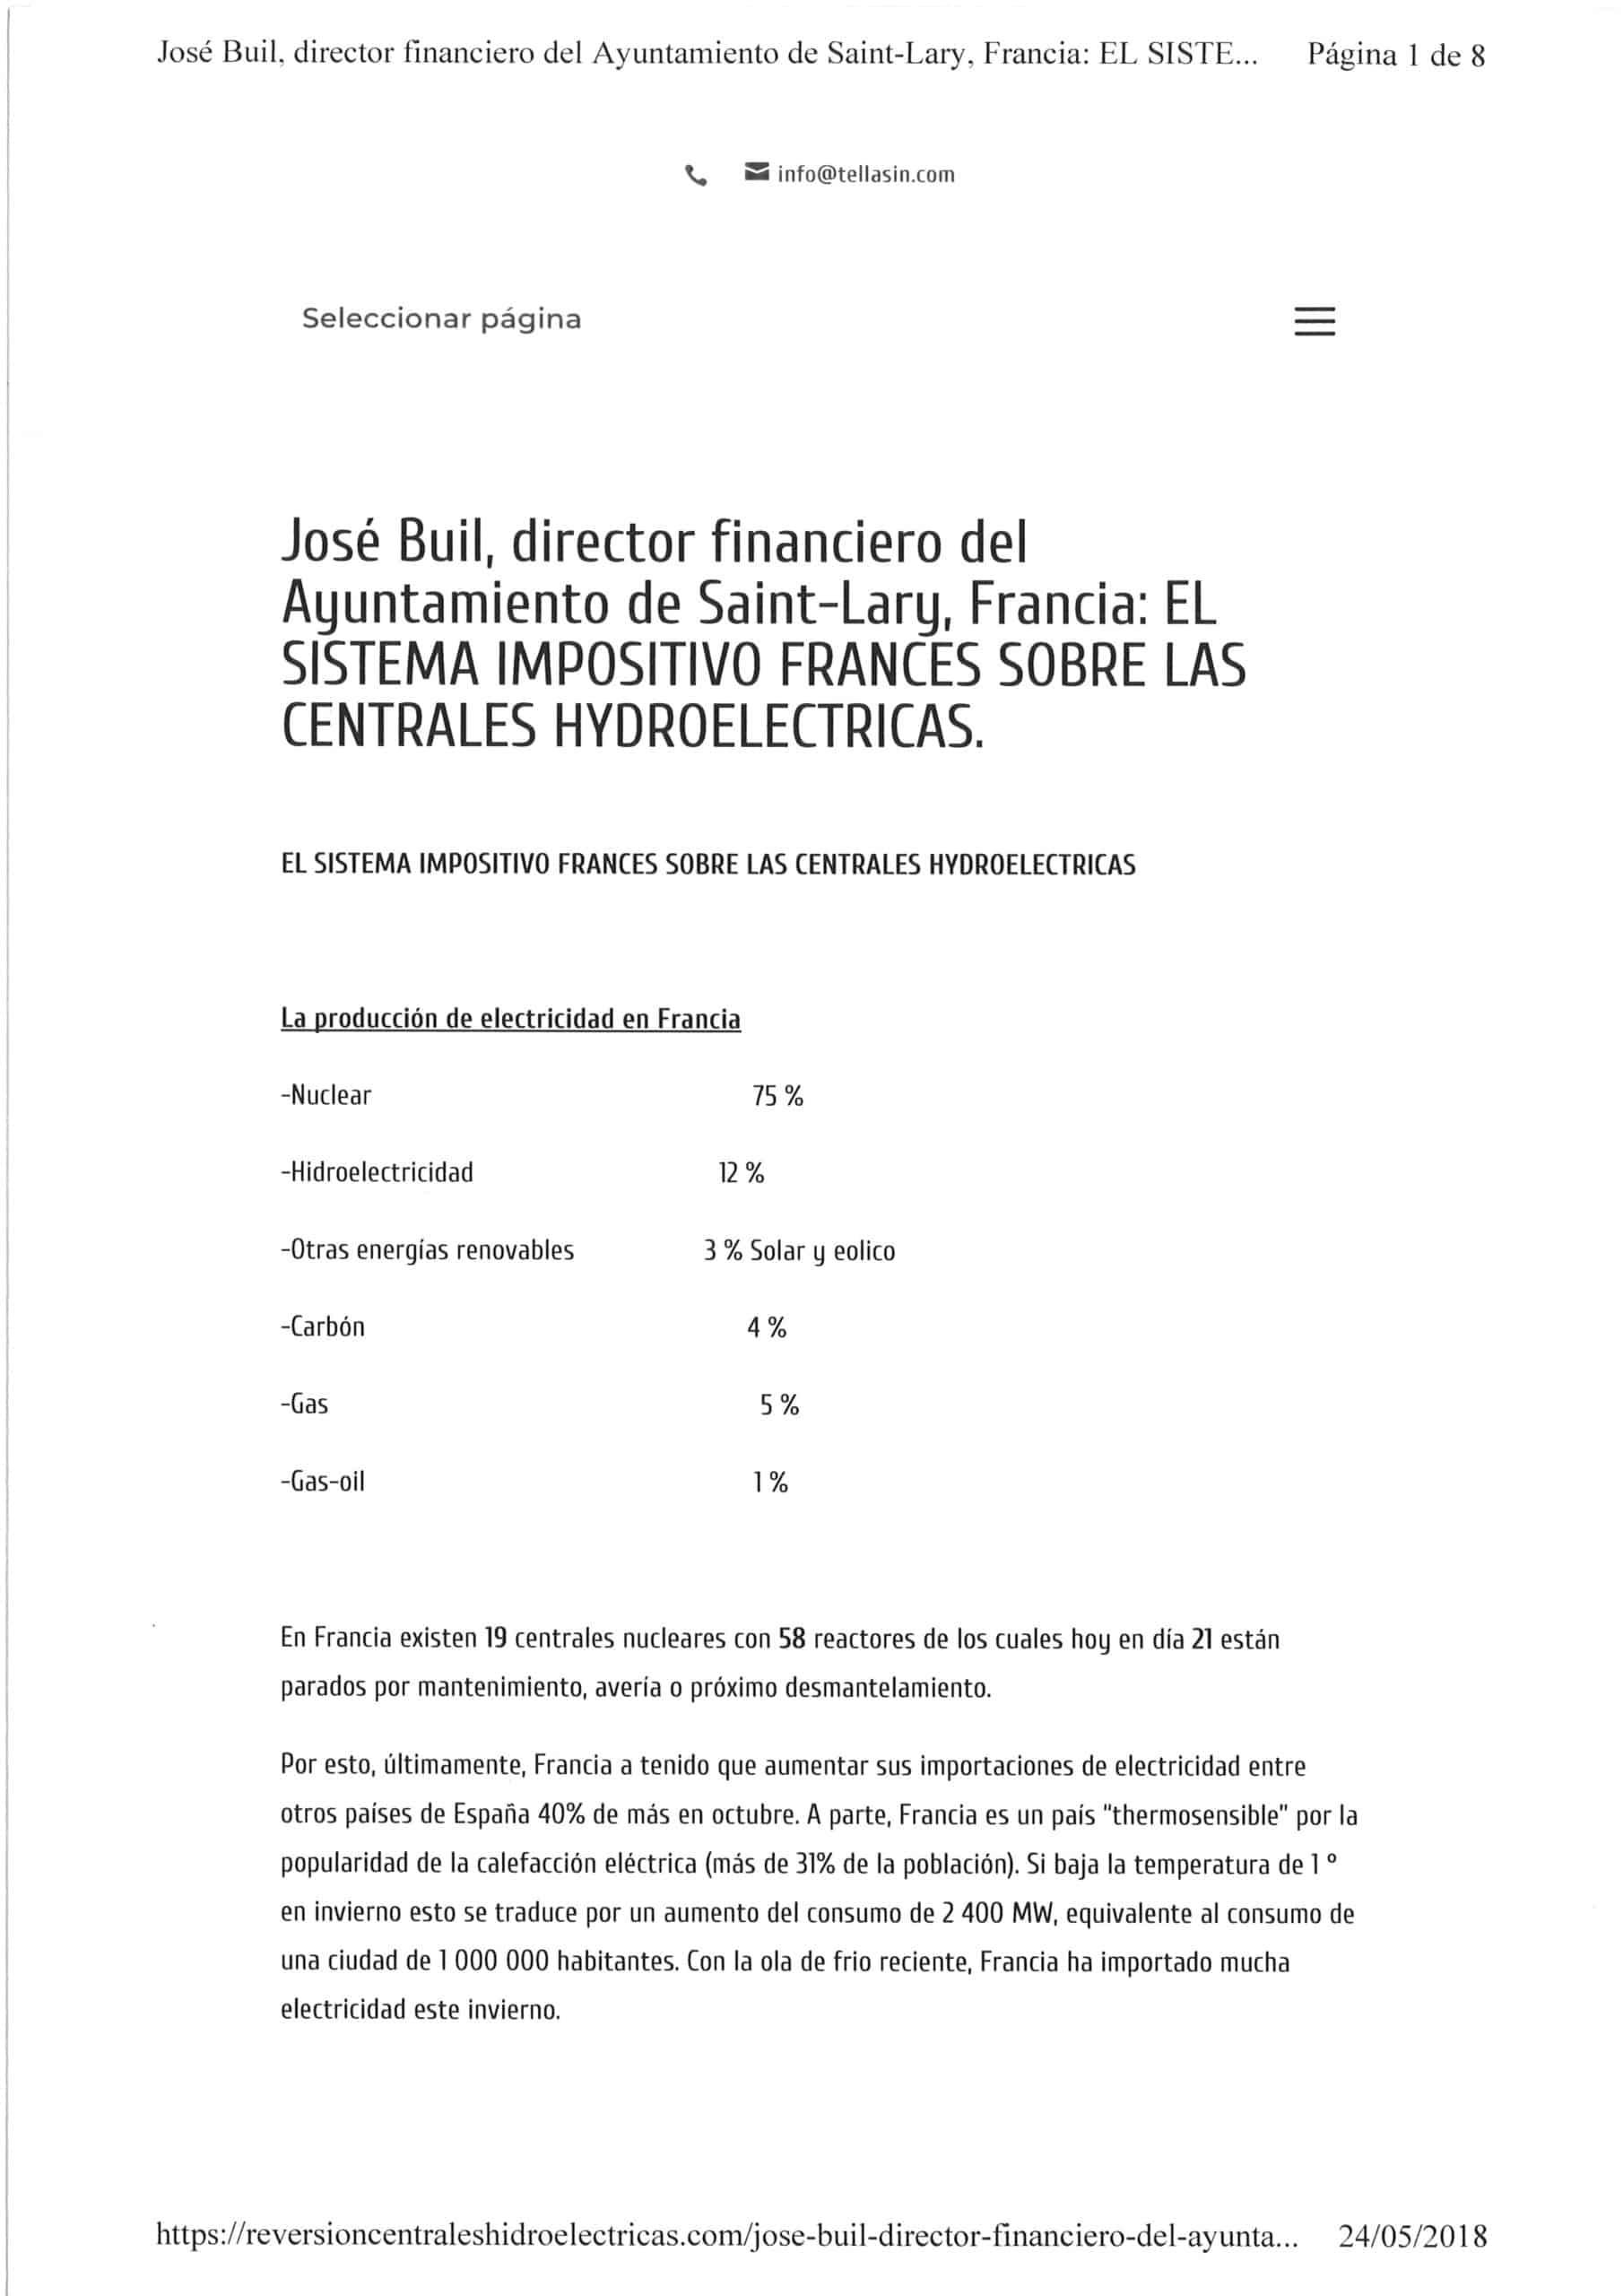 FRANCIA, sistema impositivo de centrales